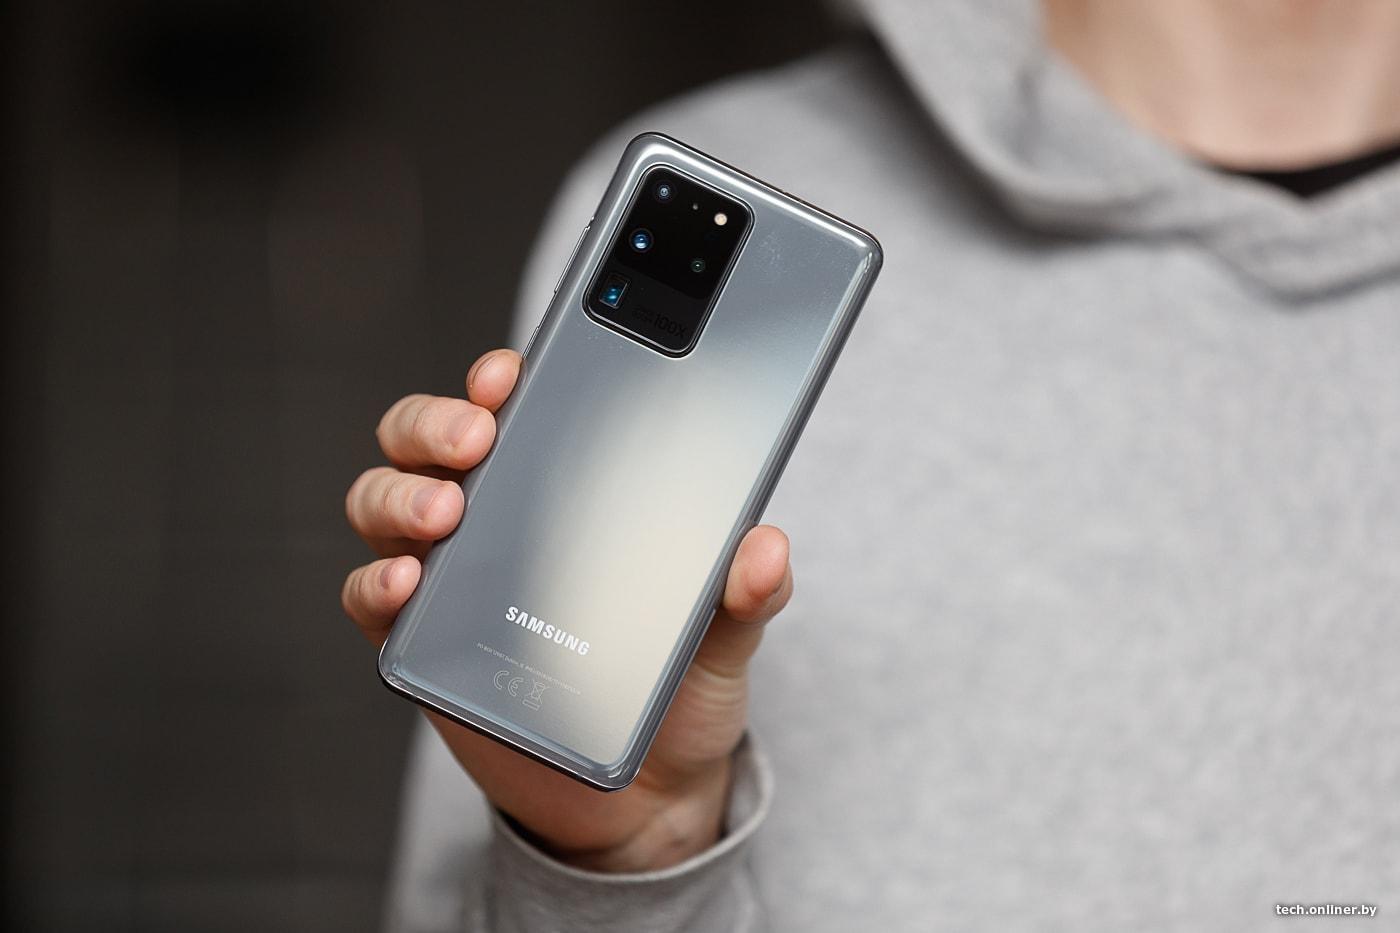 Samsung Galaxy S21 Ultra получит пентакамеру и быструю зарядку 65 Вт (1b1ea59deef1c2dda6beed614258c22a)